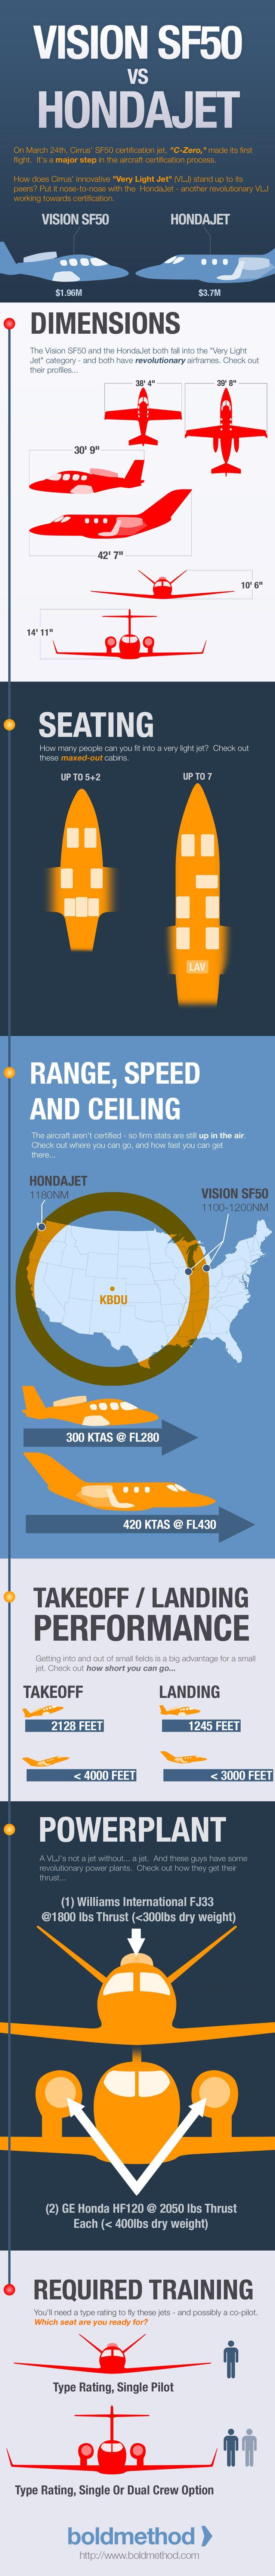 Cirrus Vision SF50 vs HondaJet - Desktop v2